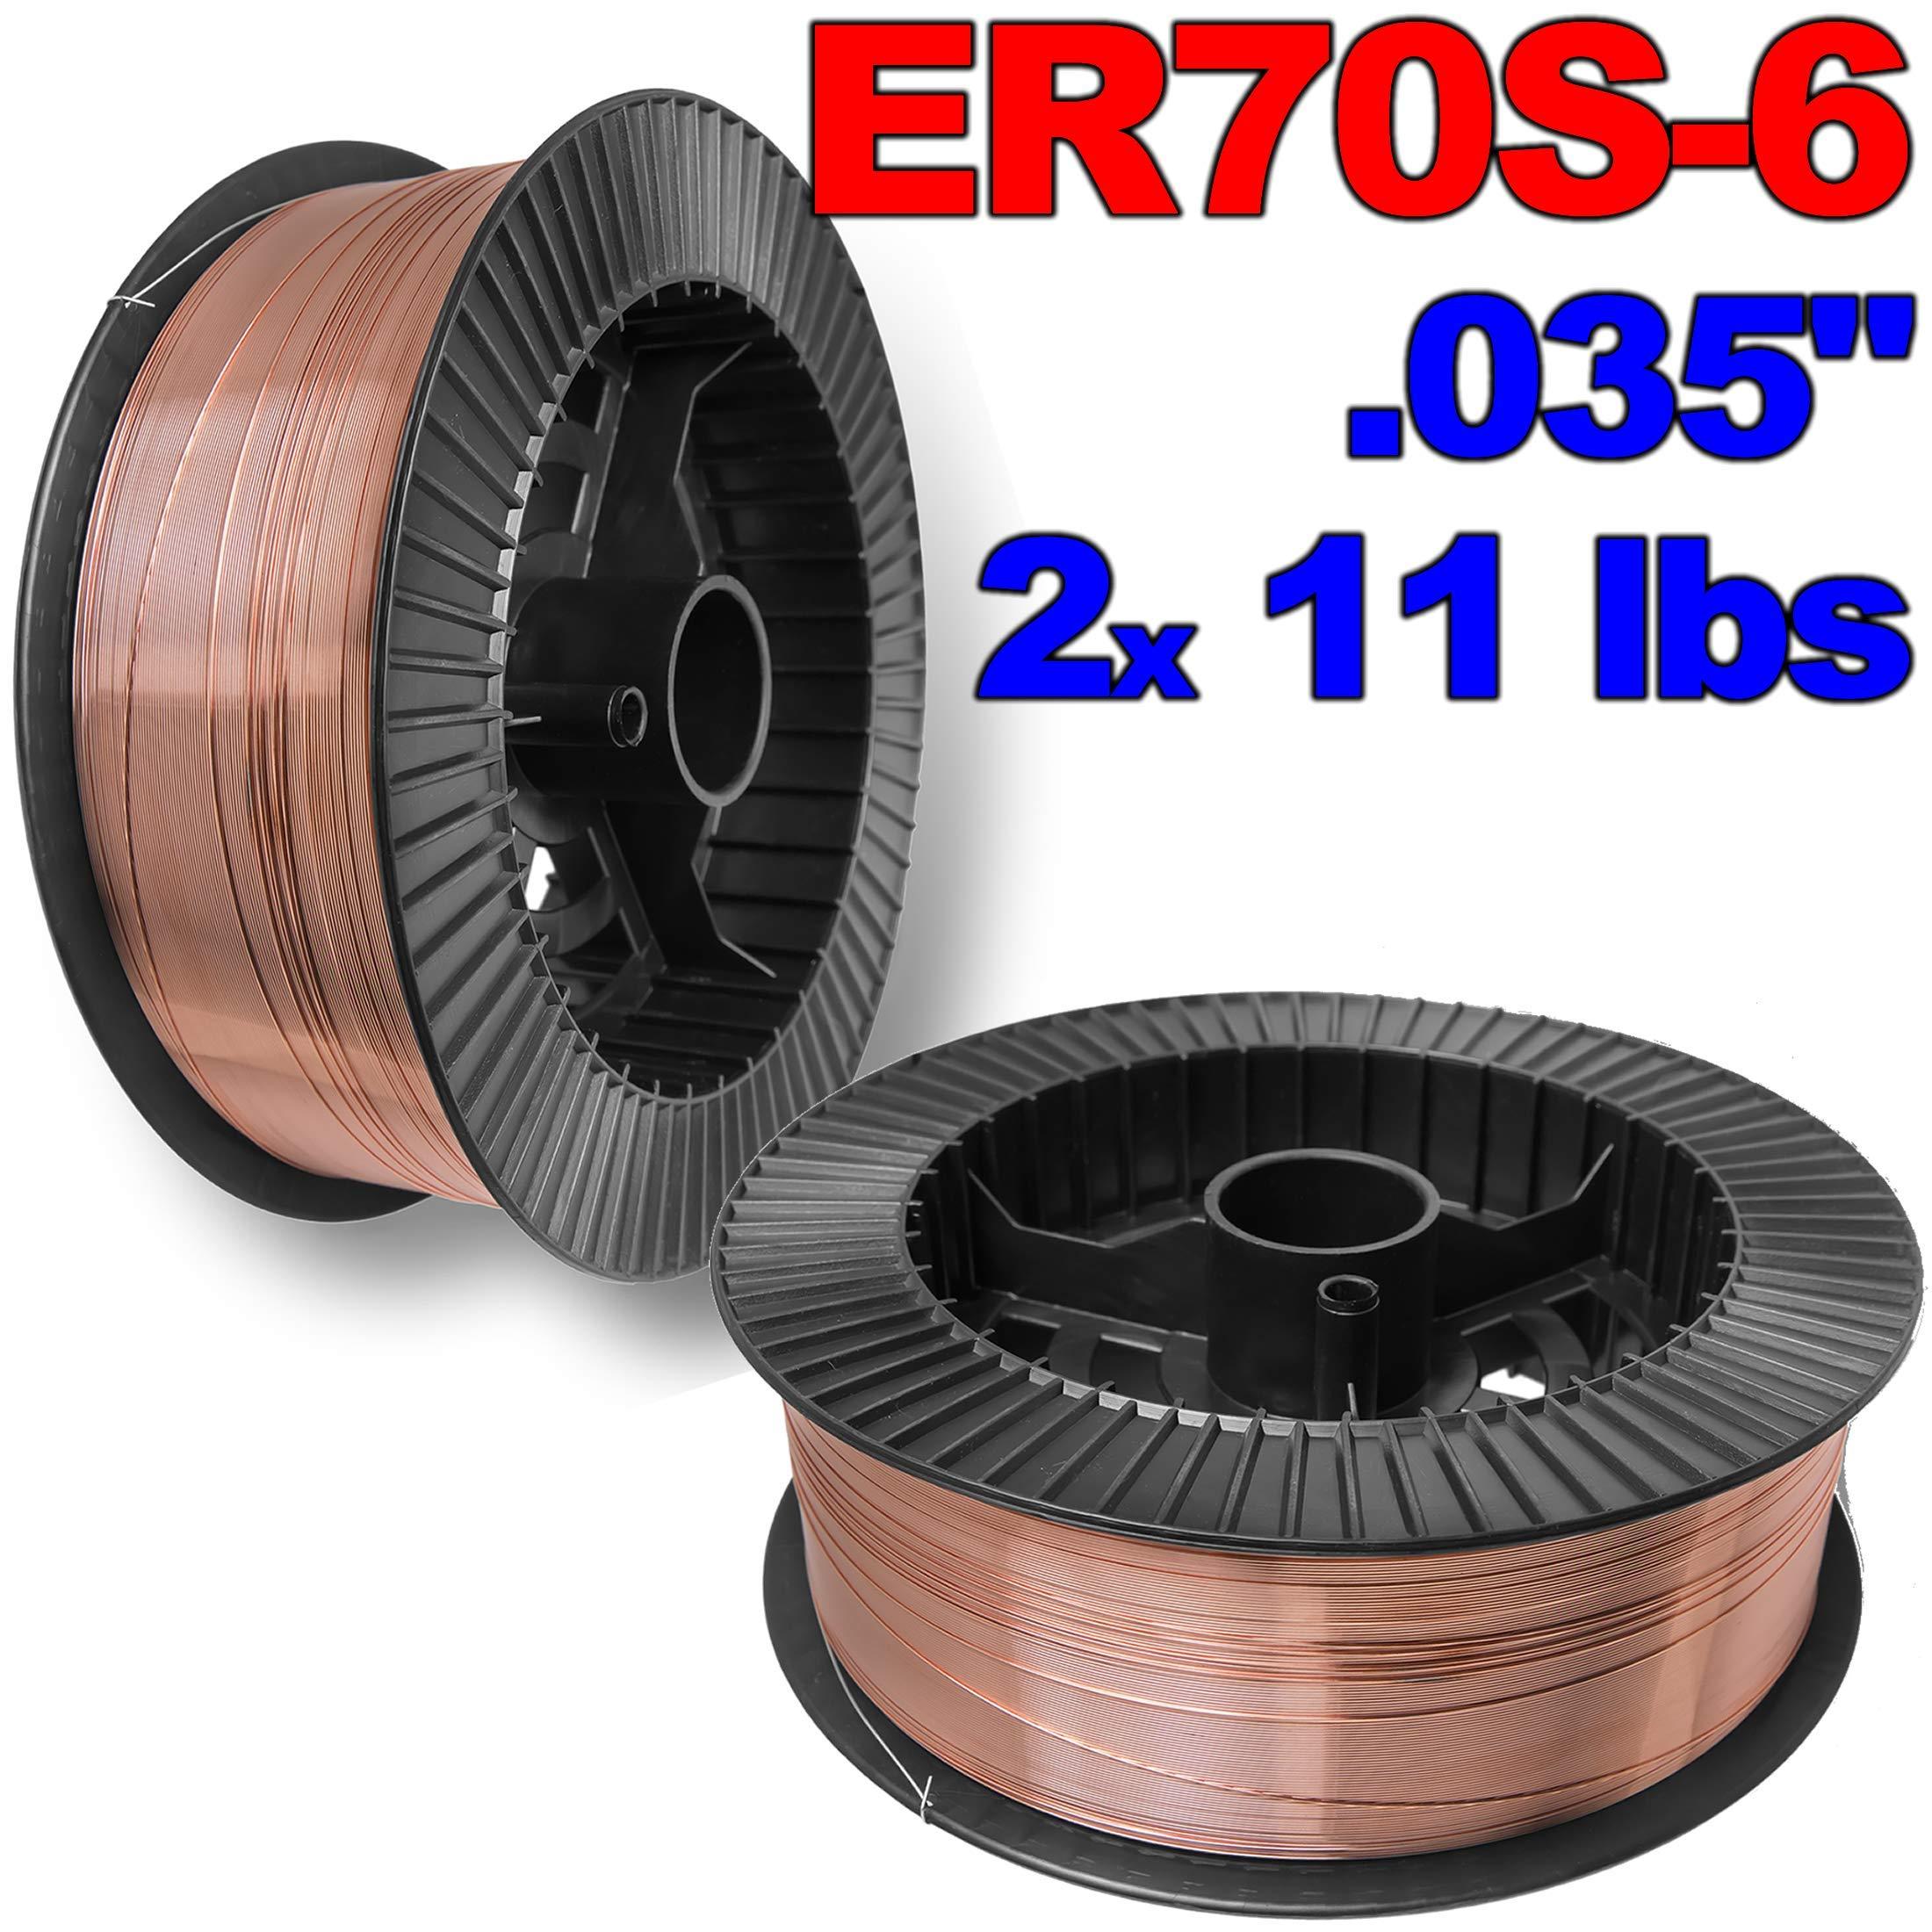 PGN - ER70S-6 .035'' (0.9 mm) Mild Steel MIG Welding Wire - 2x 11 Lbs Spool by PGN Bearings